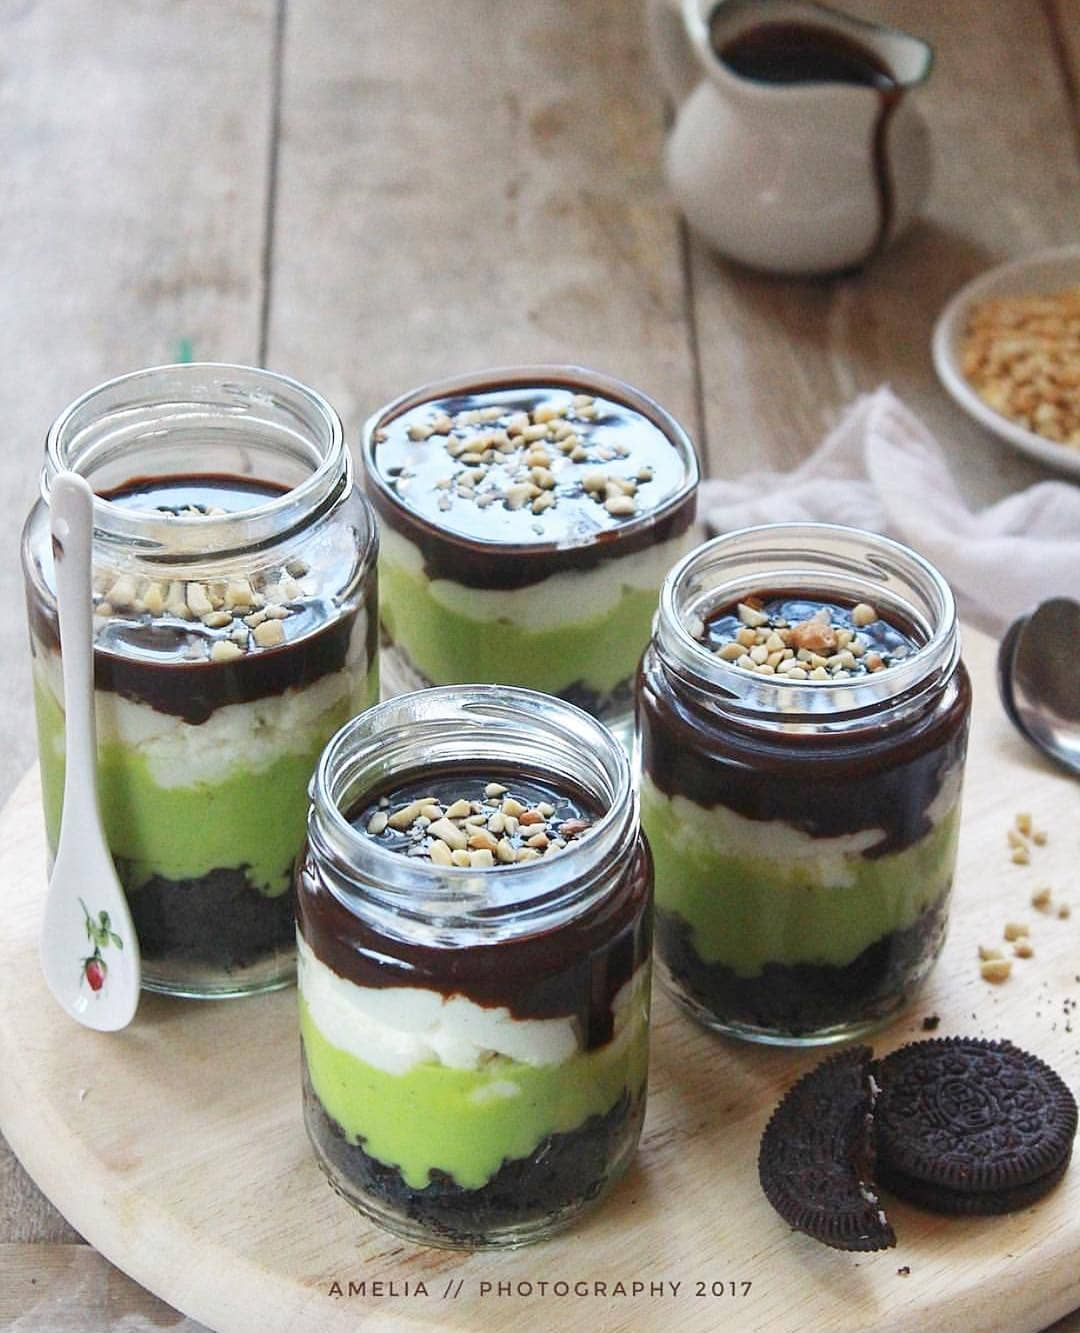 Aneka Resep Rumahan On Instagram Kasih Love Dulu Yah Oreo Alpukat Oreokat Cake Oreo Kue Camilan Resep Makanan Penutup Kue Oreo